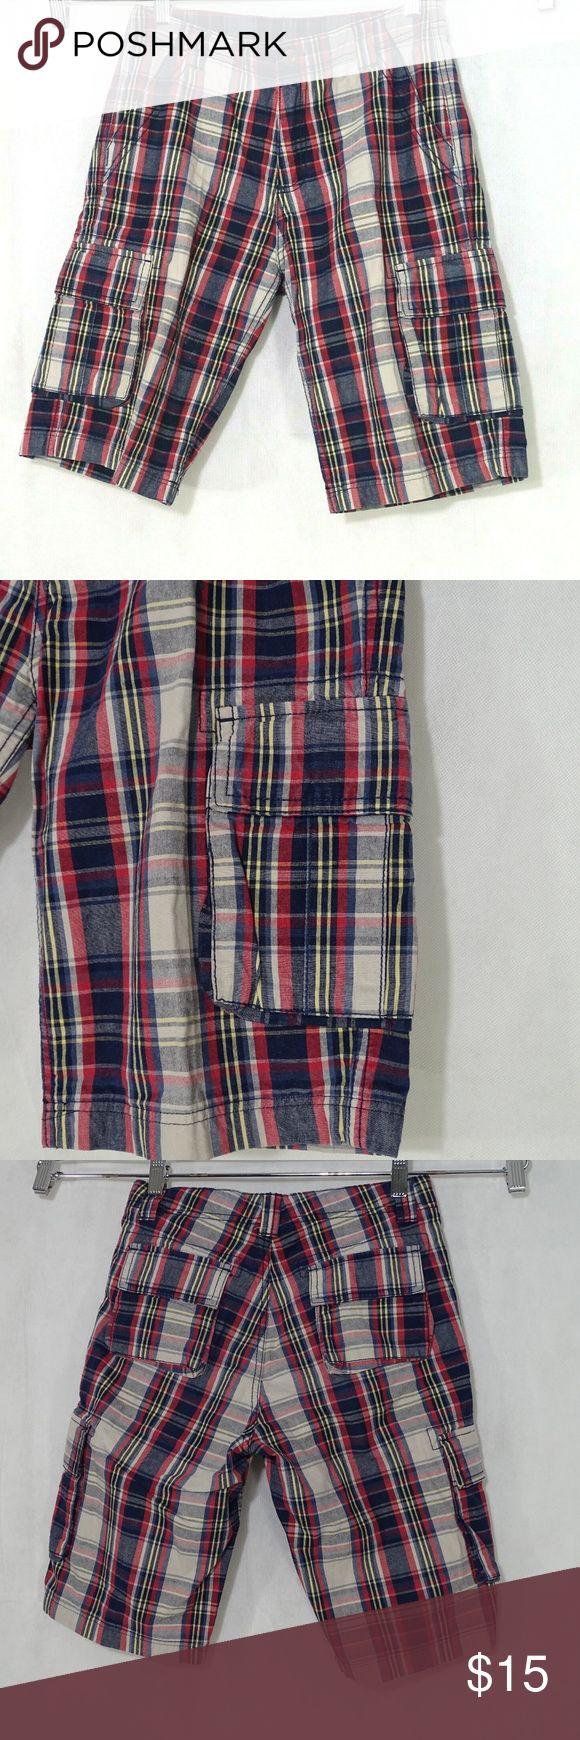 GreyRedBlue Knitted Boys Lace Up